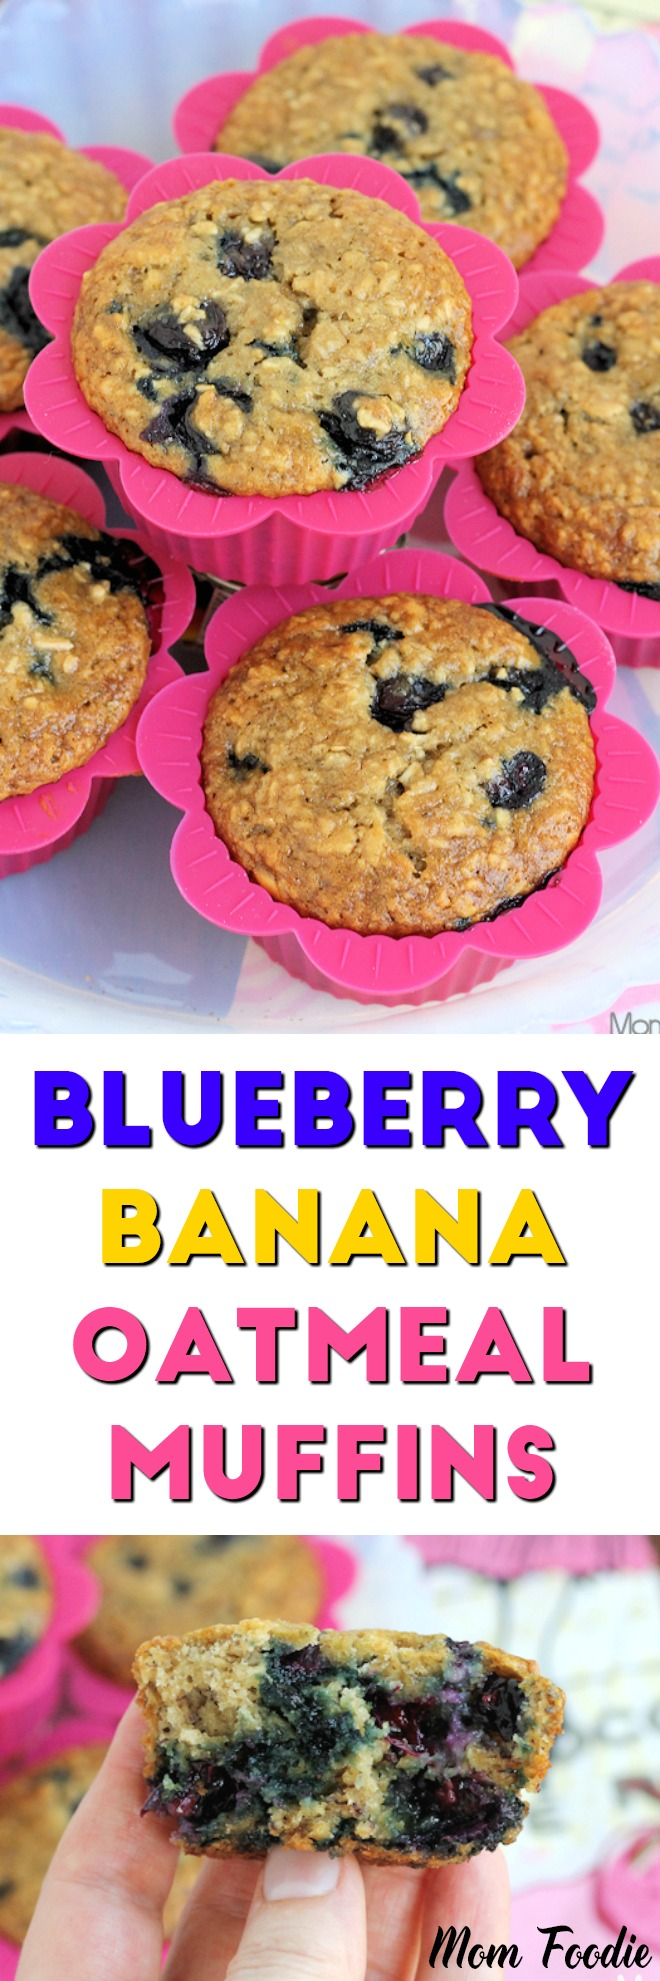 Blueberry Banana Oatmeal Muffins Recipe